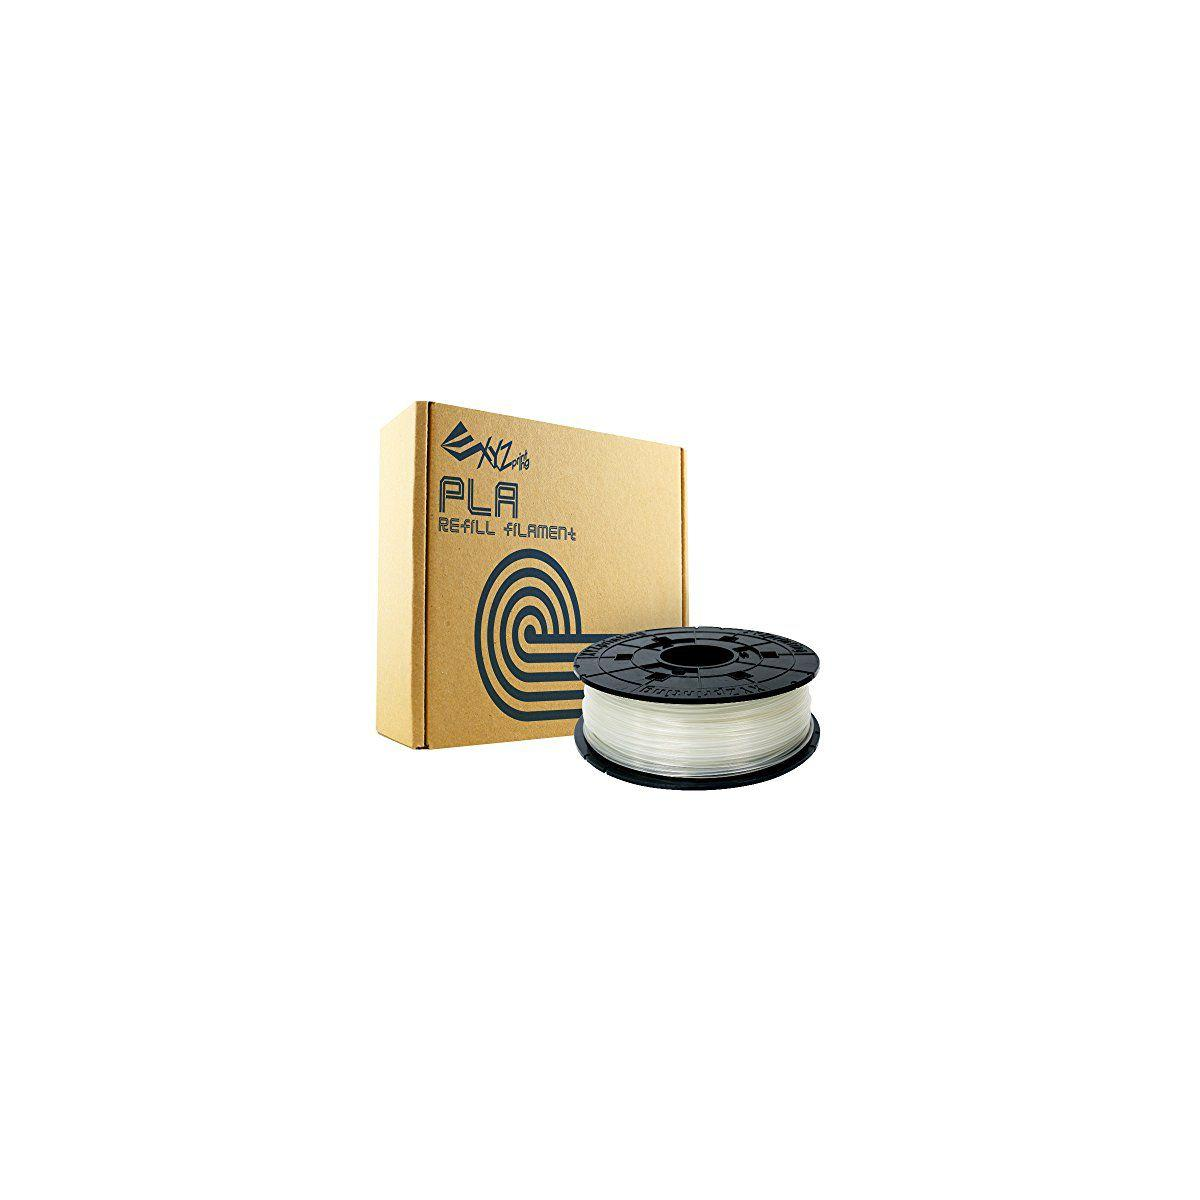 Filament 3d xyz printing bobine recharge pla naturel - 2% de r...